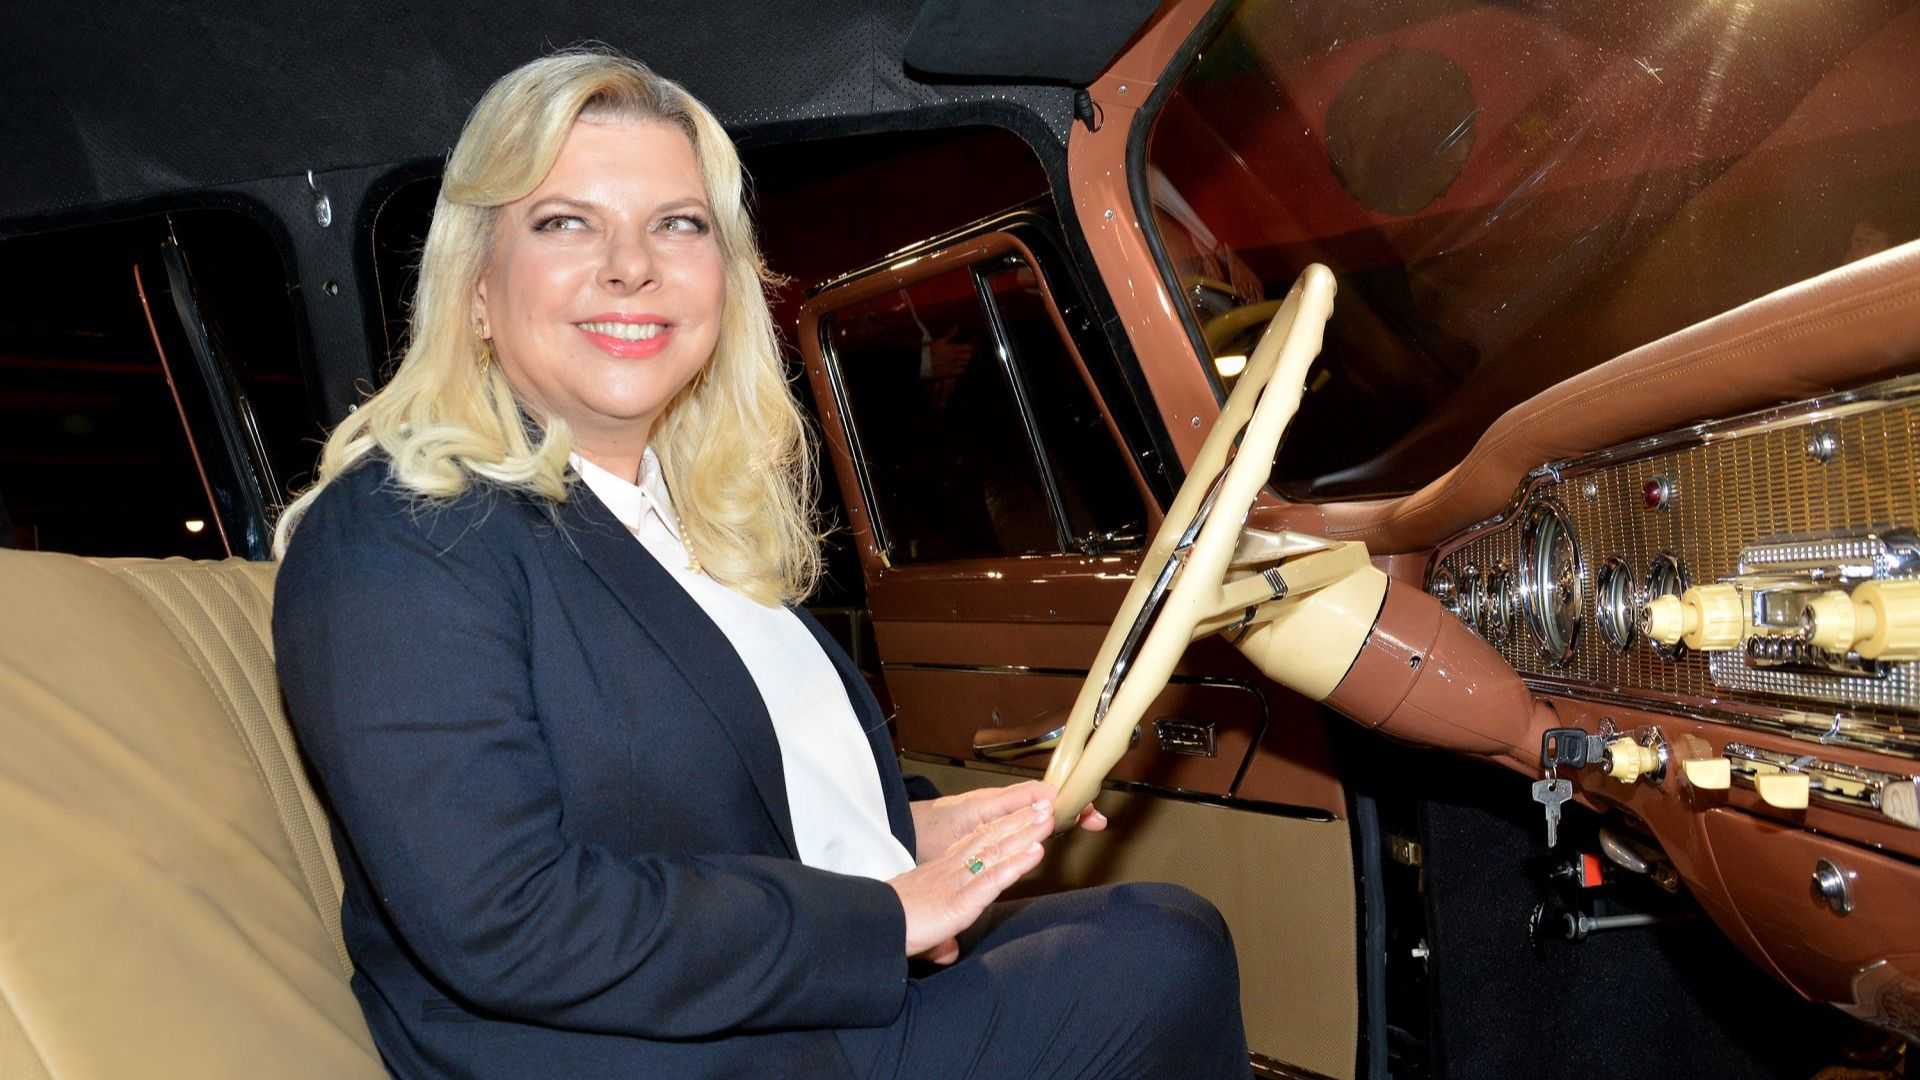 Сара Нетаняху се качи в лимузината на Живков (снимки)